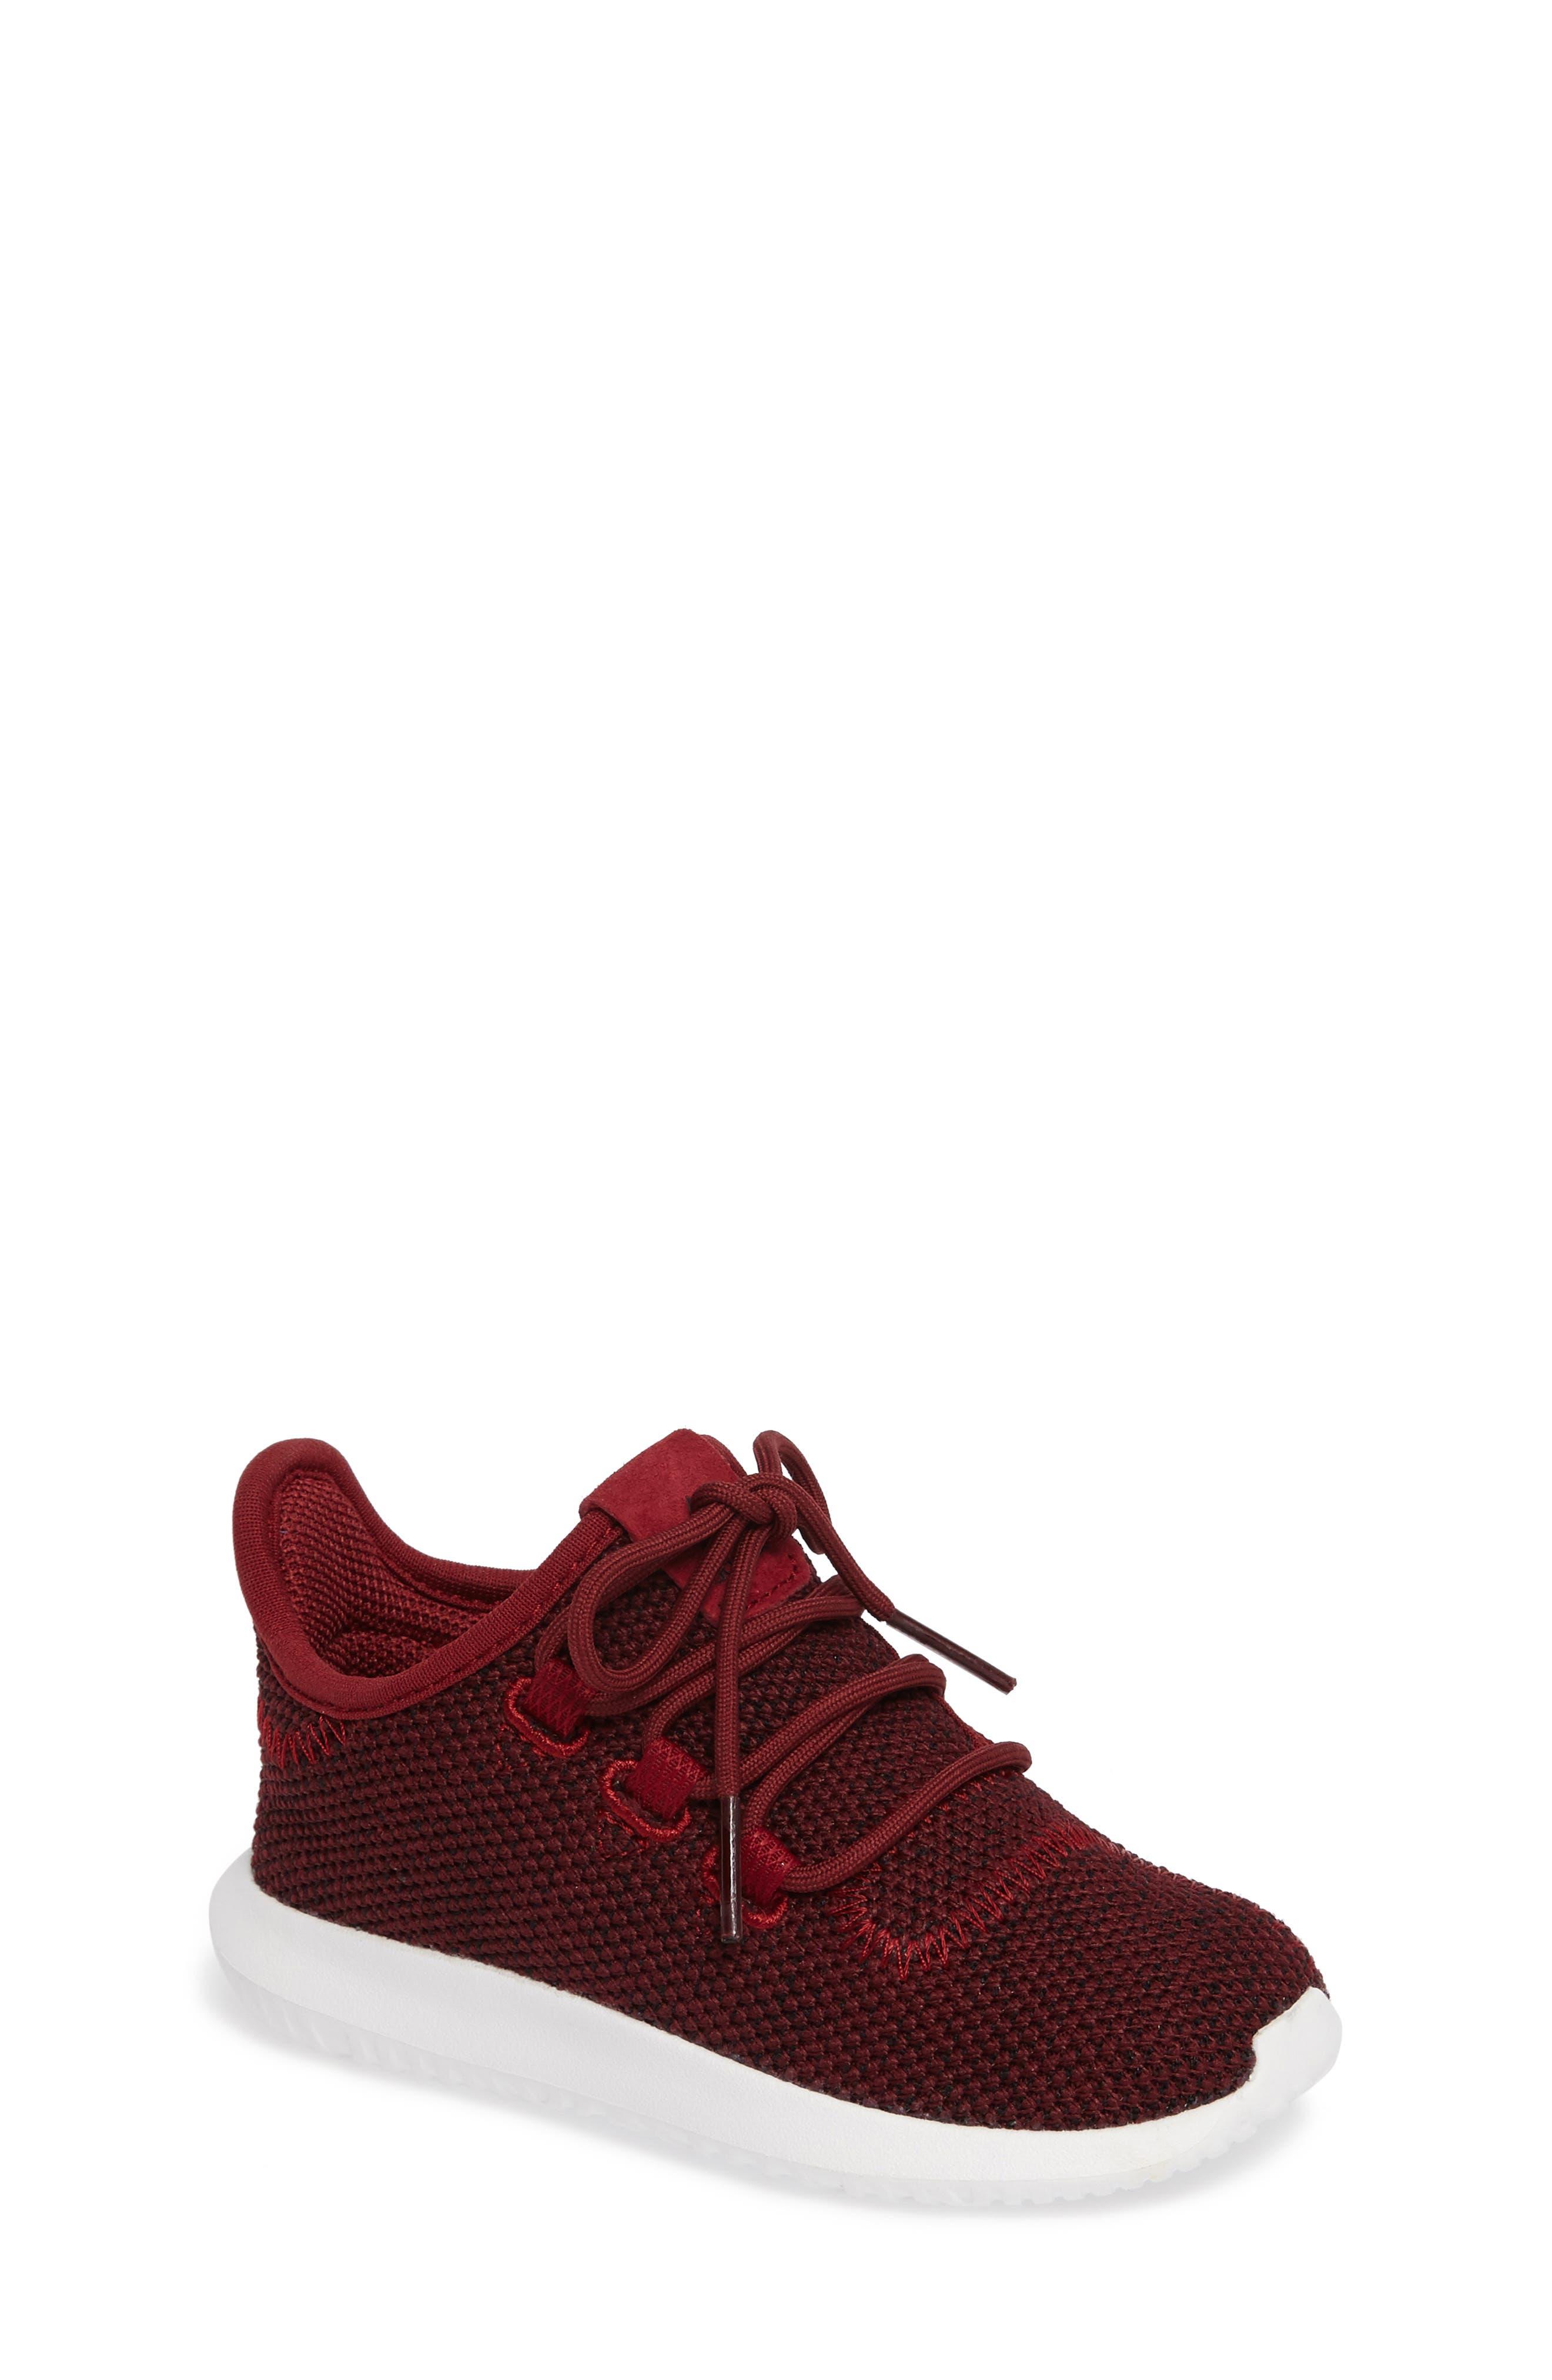 adidas Tubular Shadow 1 Knit Sneaker (Baby, Walker & Toddler)